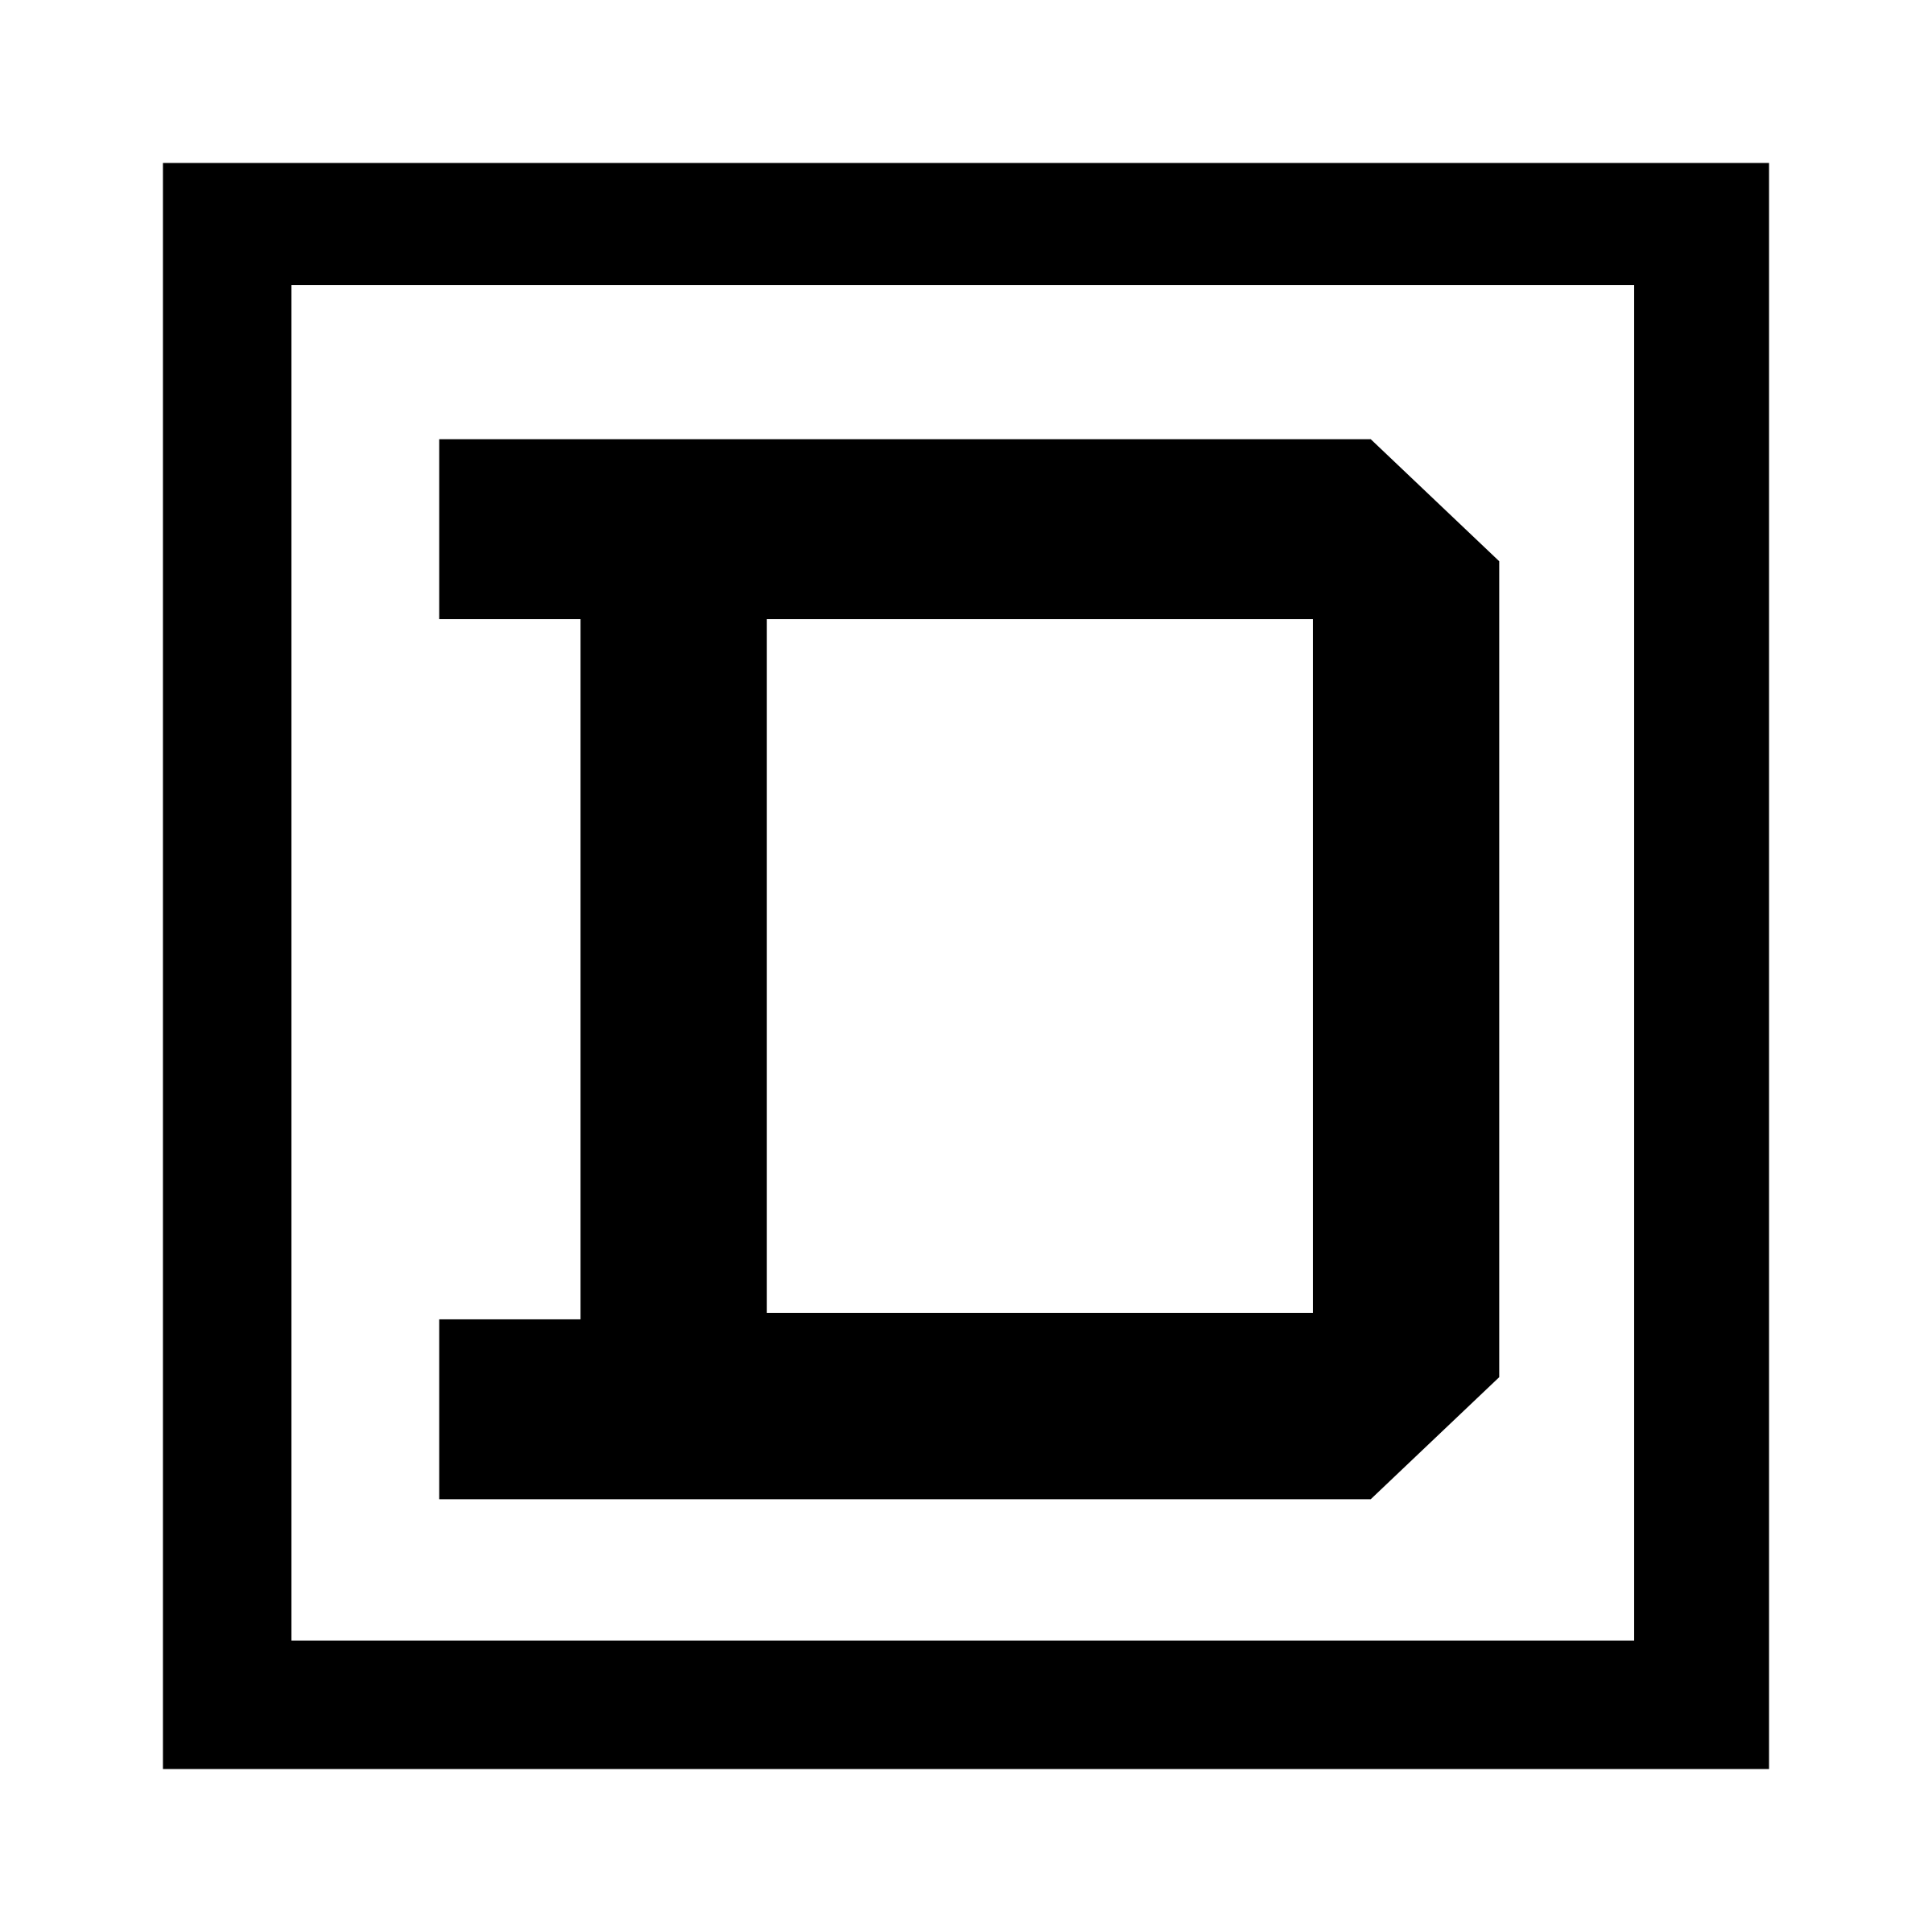 Square clipart vector black. D logo png transparent